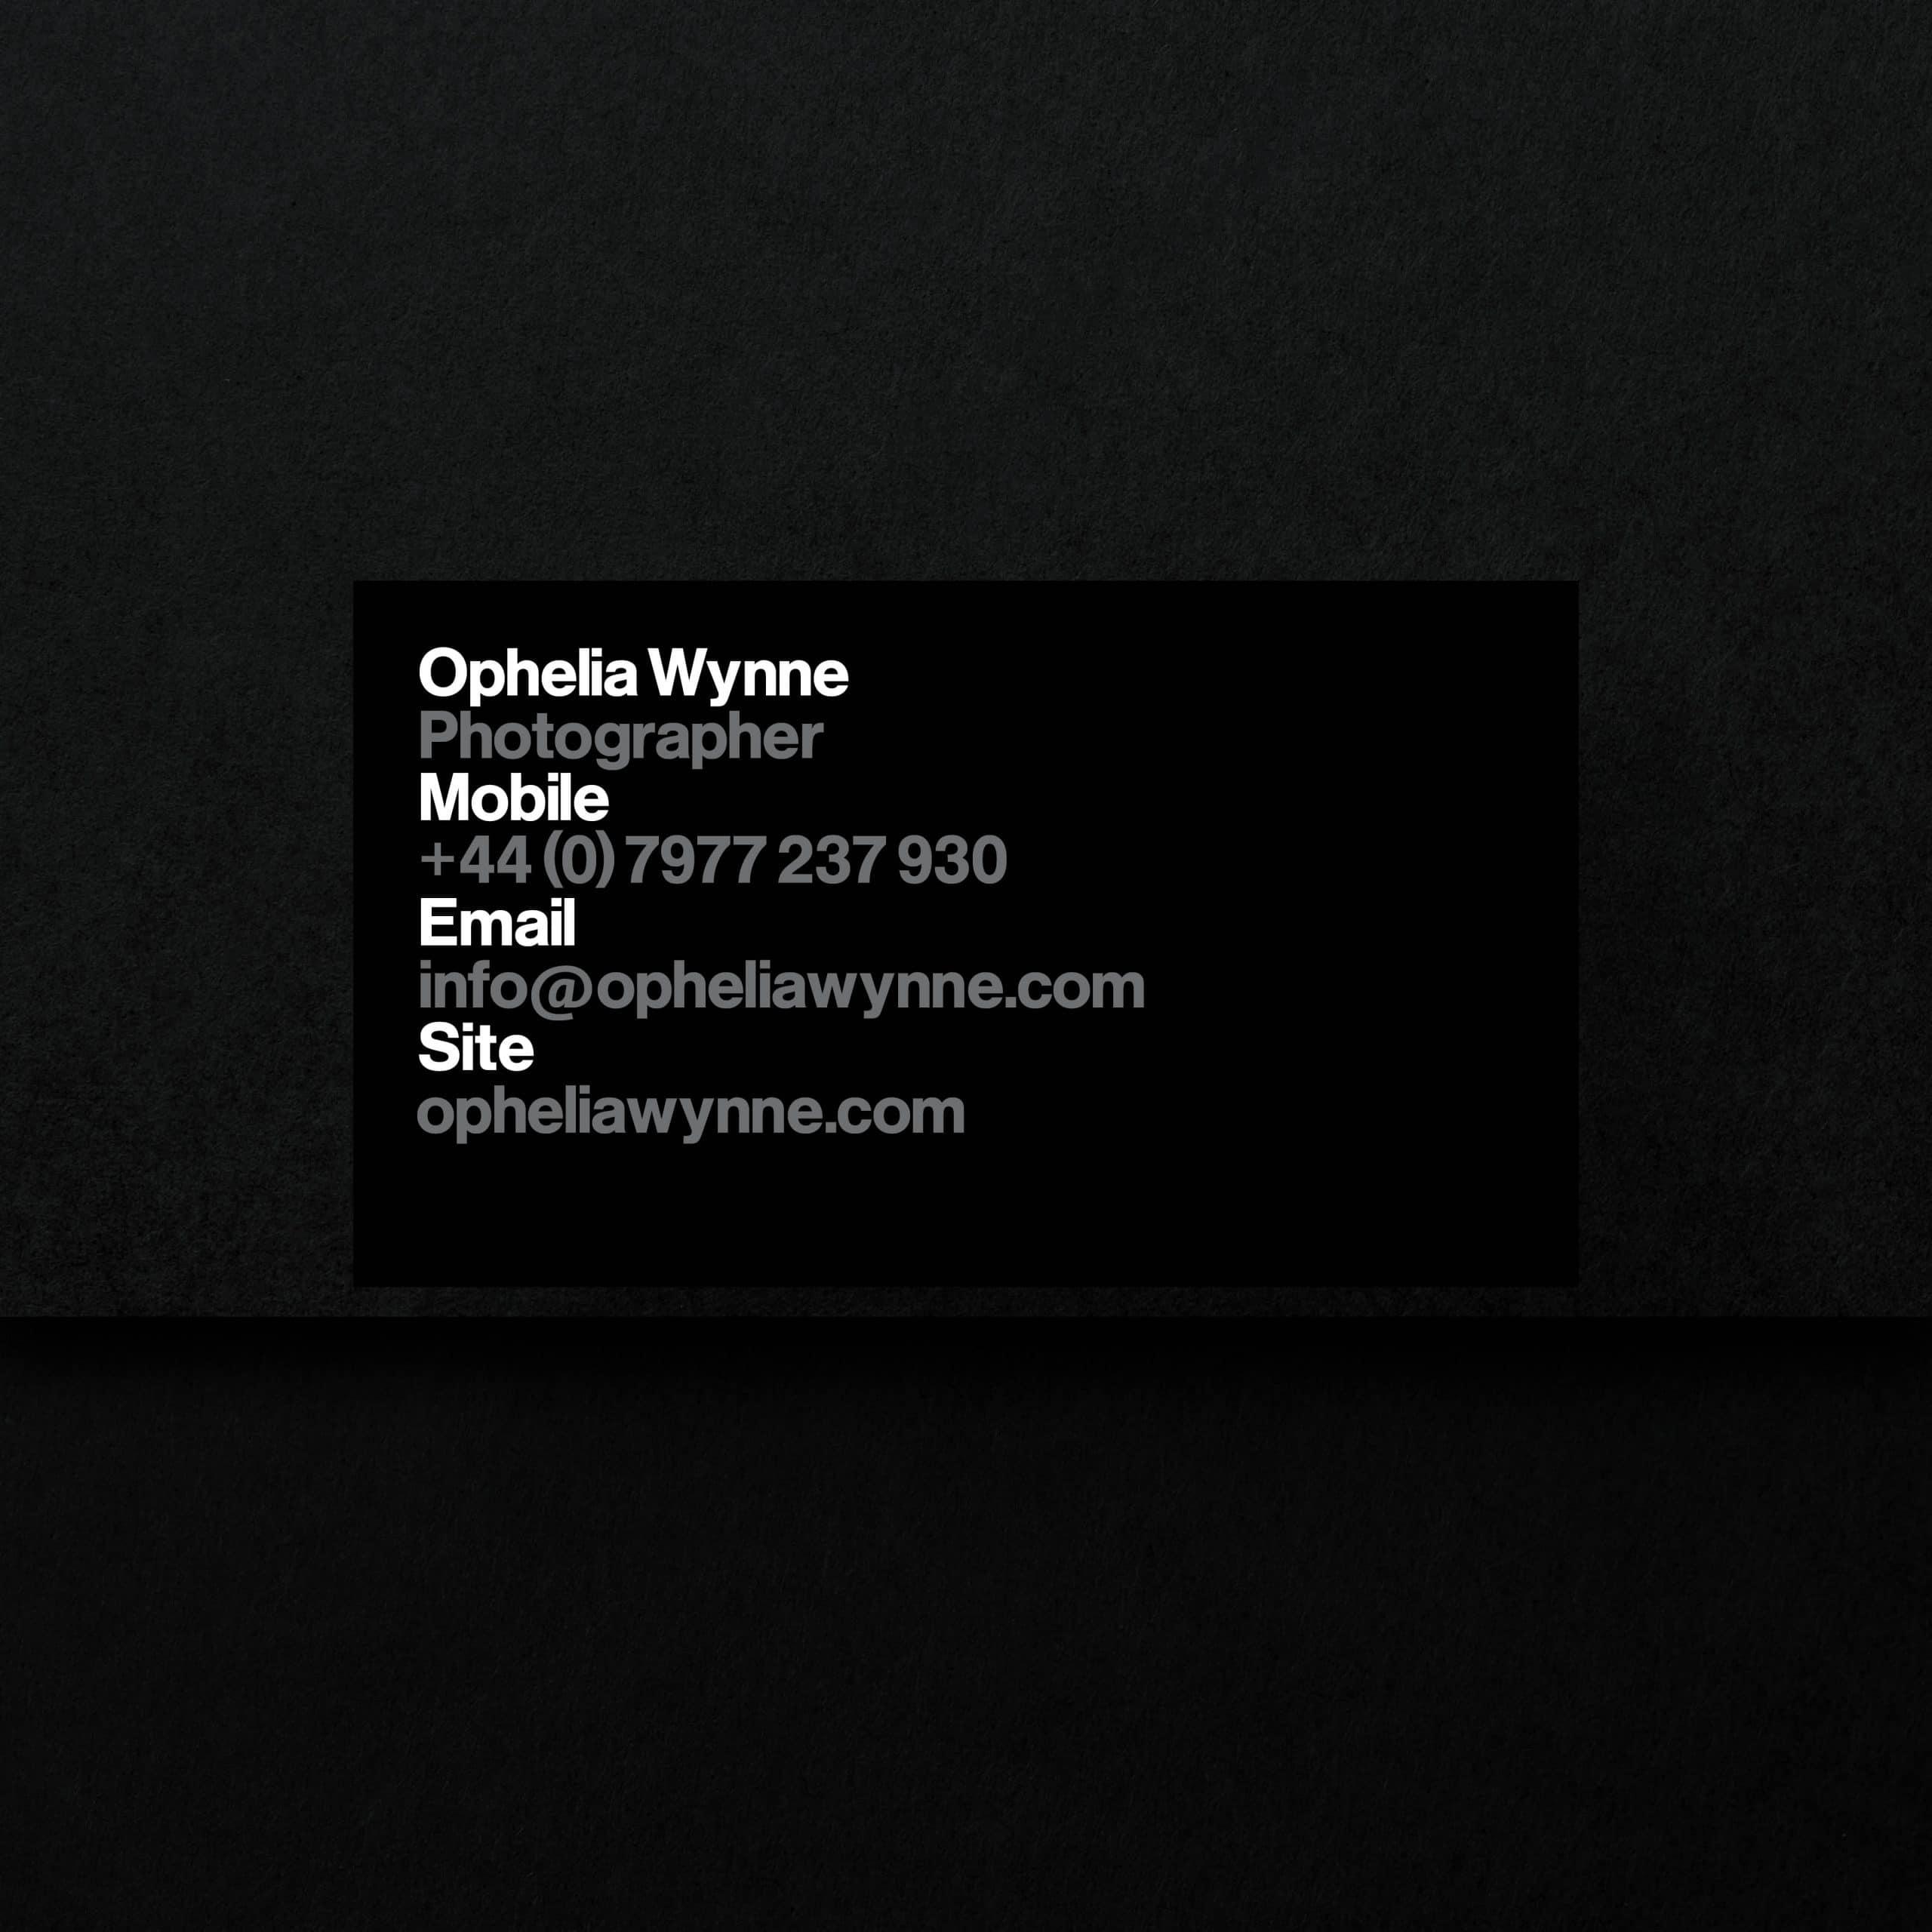 Ophelia Wynne - business card